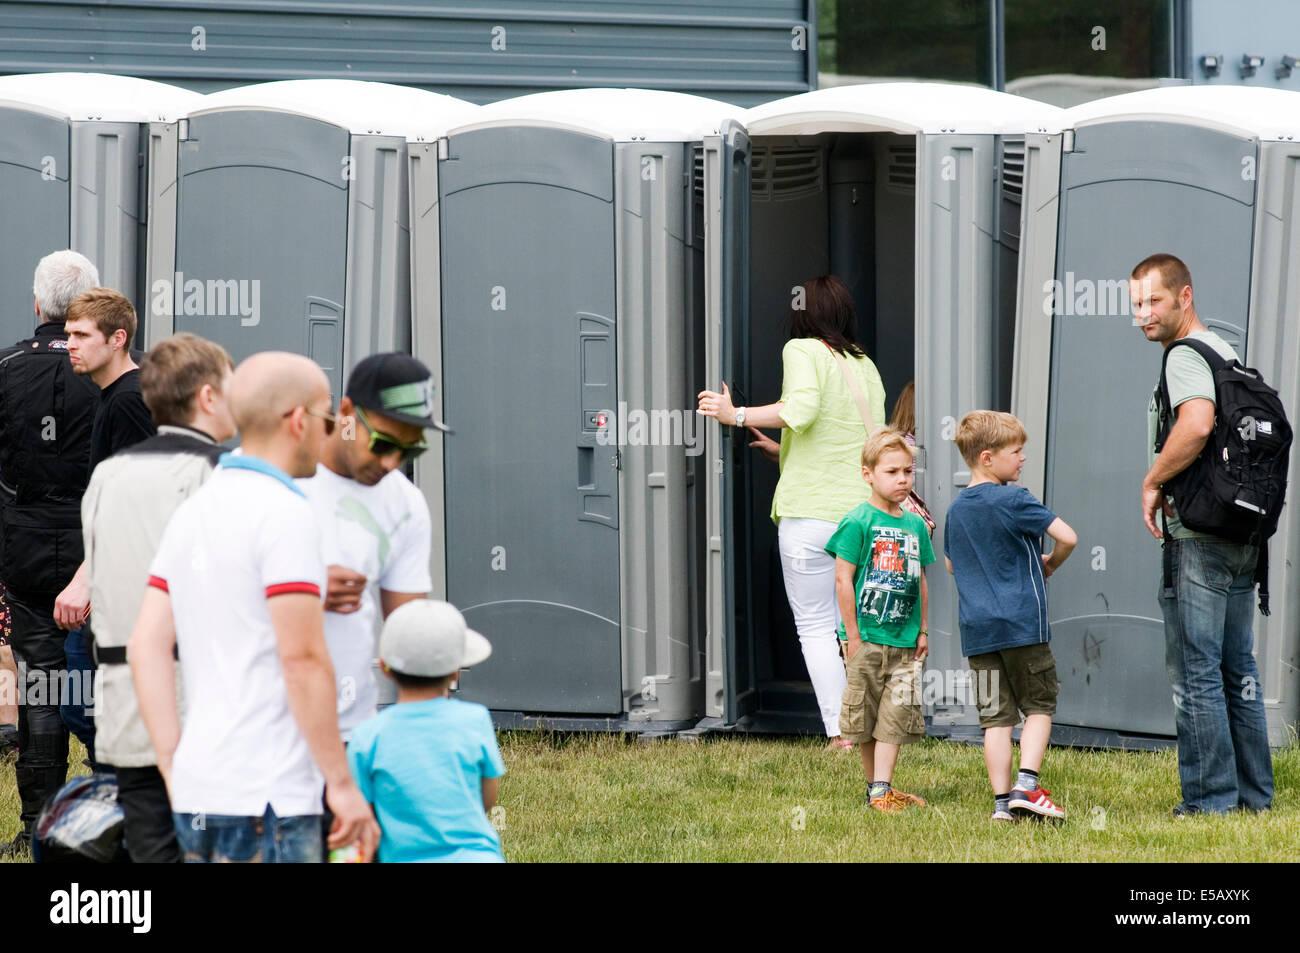 portaloo loo toilet toilets event events outdoor sanitation - Stock Image